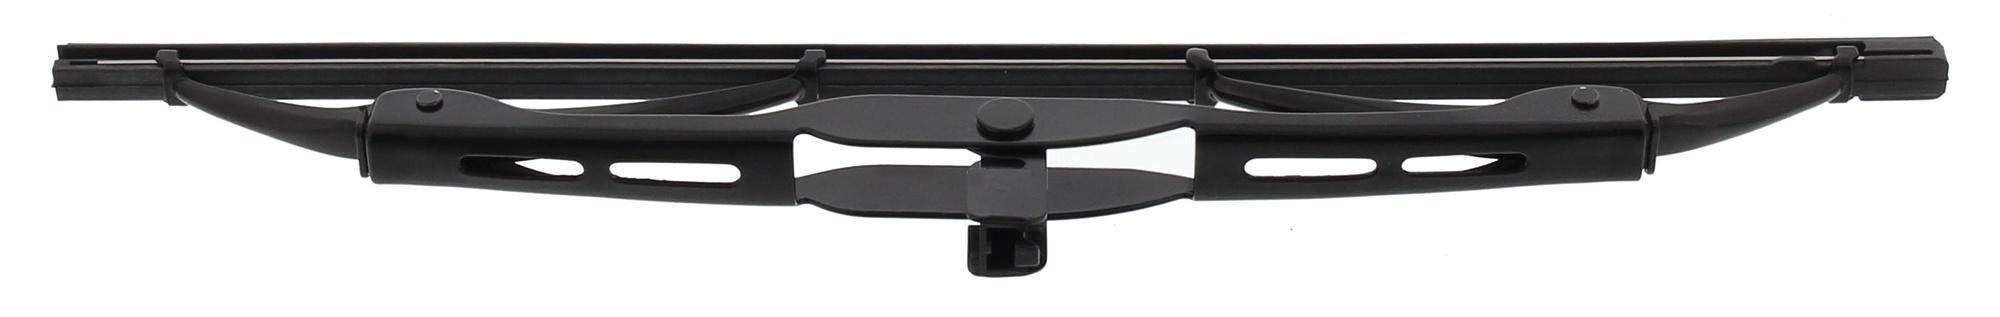 MAPCO 104928 Bügelwischer 280 mm hinten